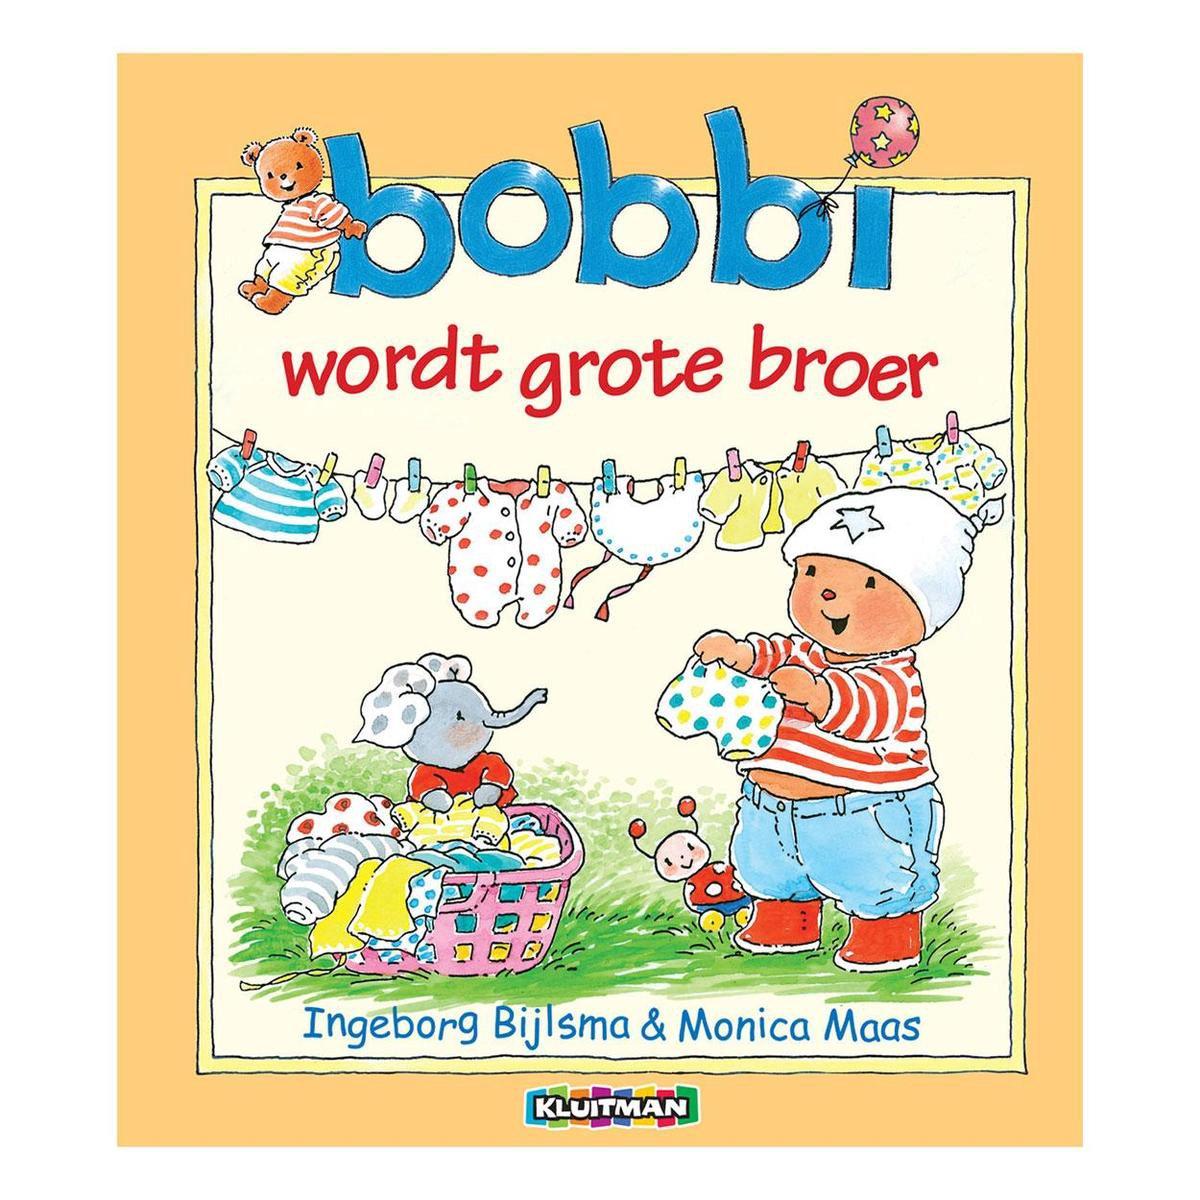 Bijlsma, Ingeborg & Monica Maas - Bobbi wordt grote broer